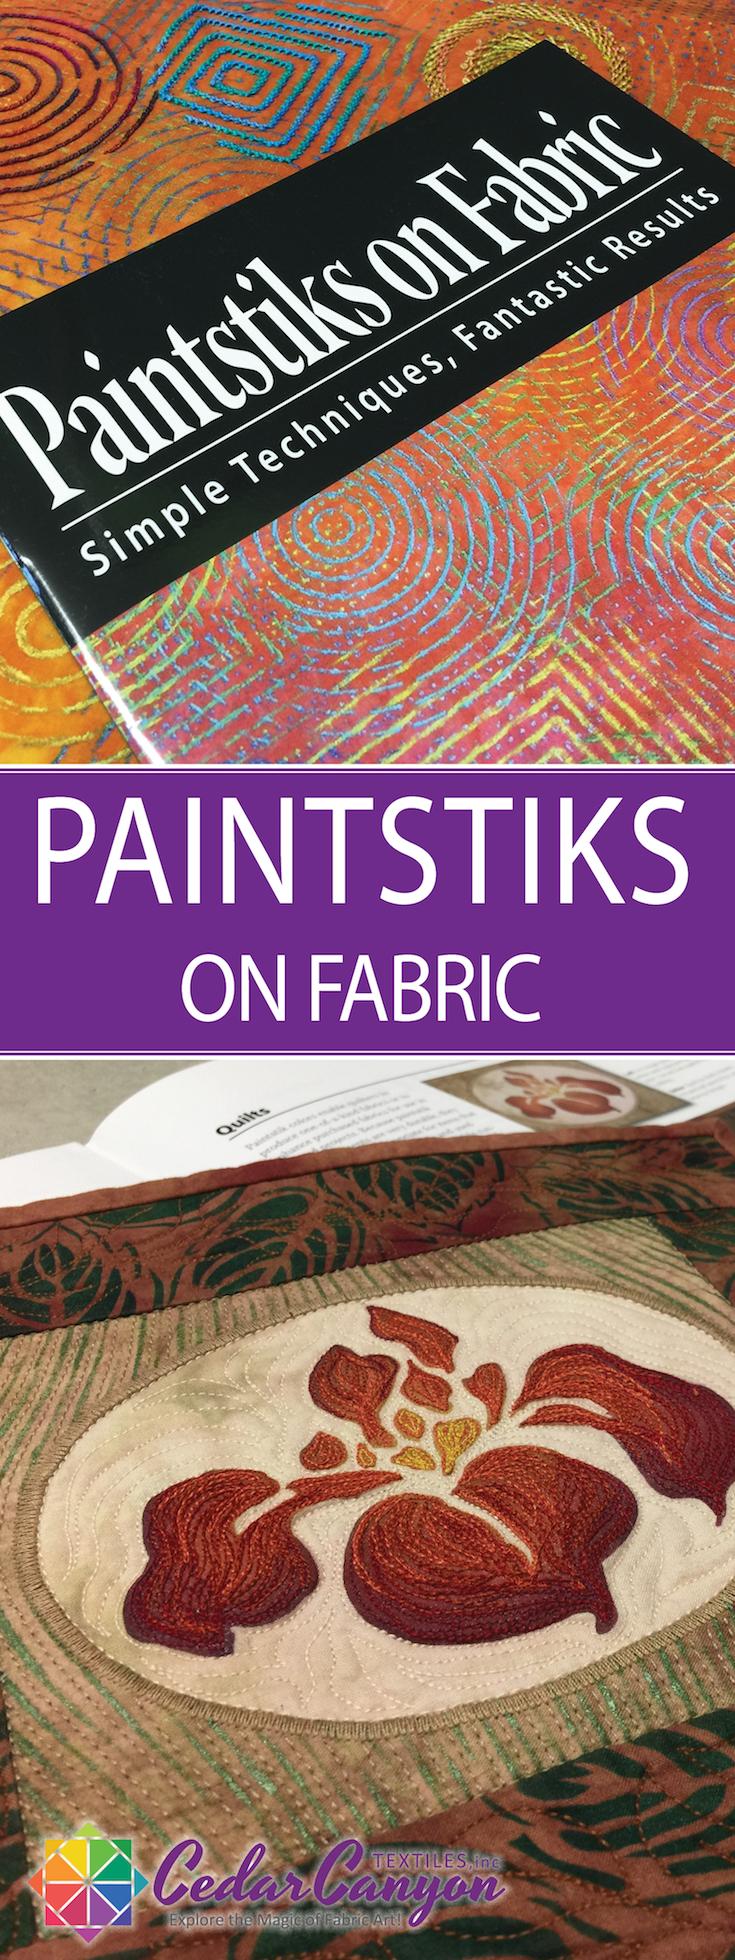 paintstiks-on-fabric-pin